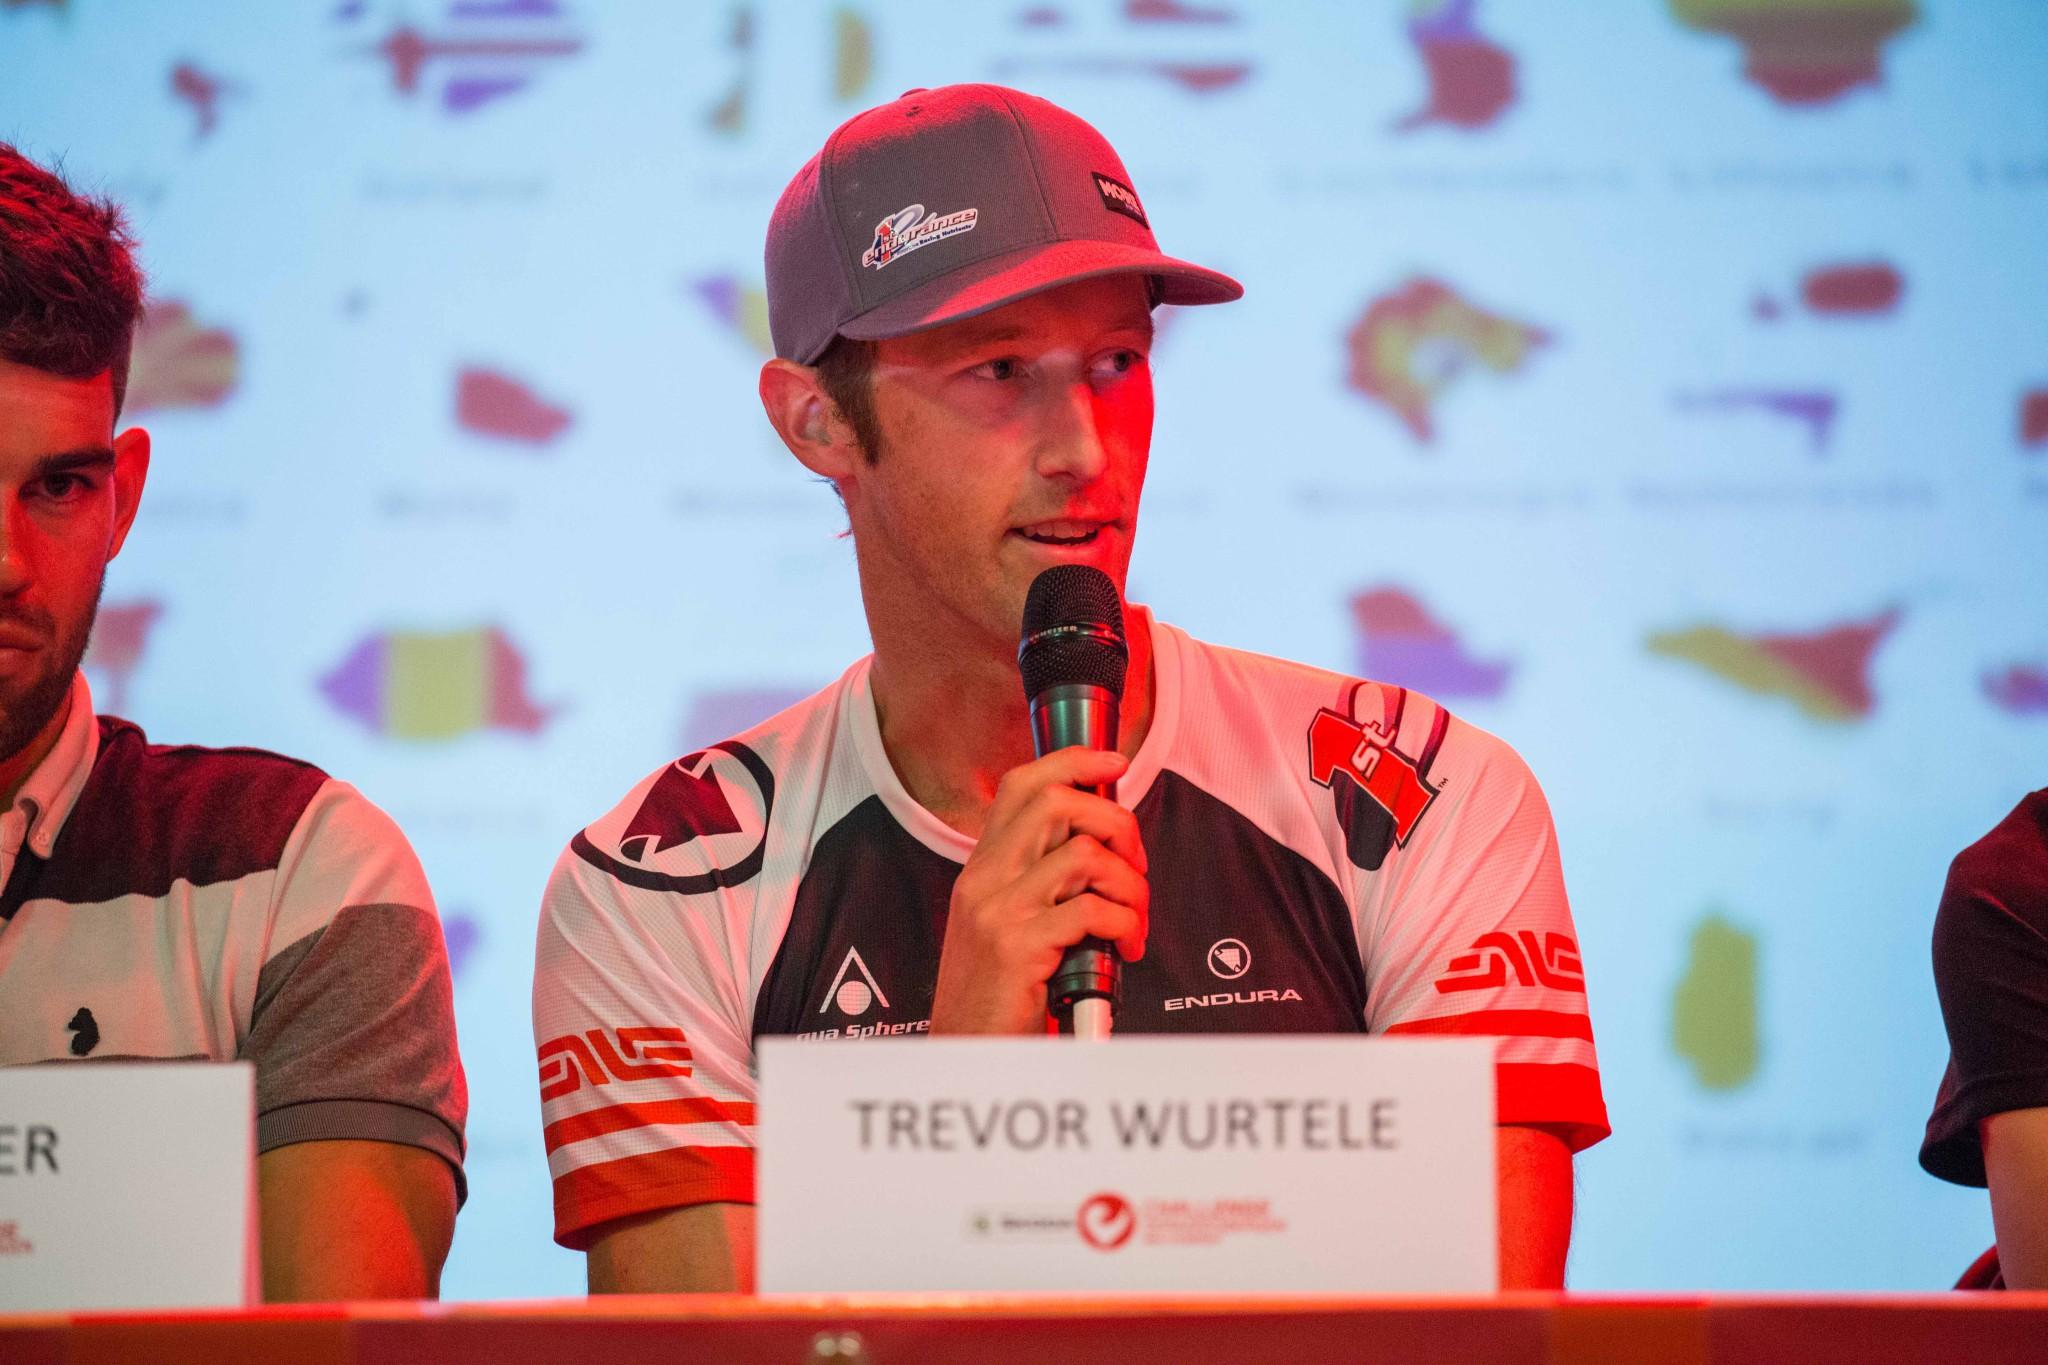 Trevor Wurtele Gbergen press